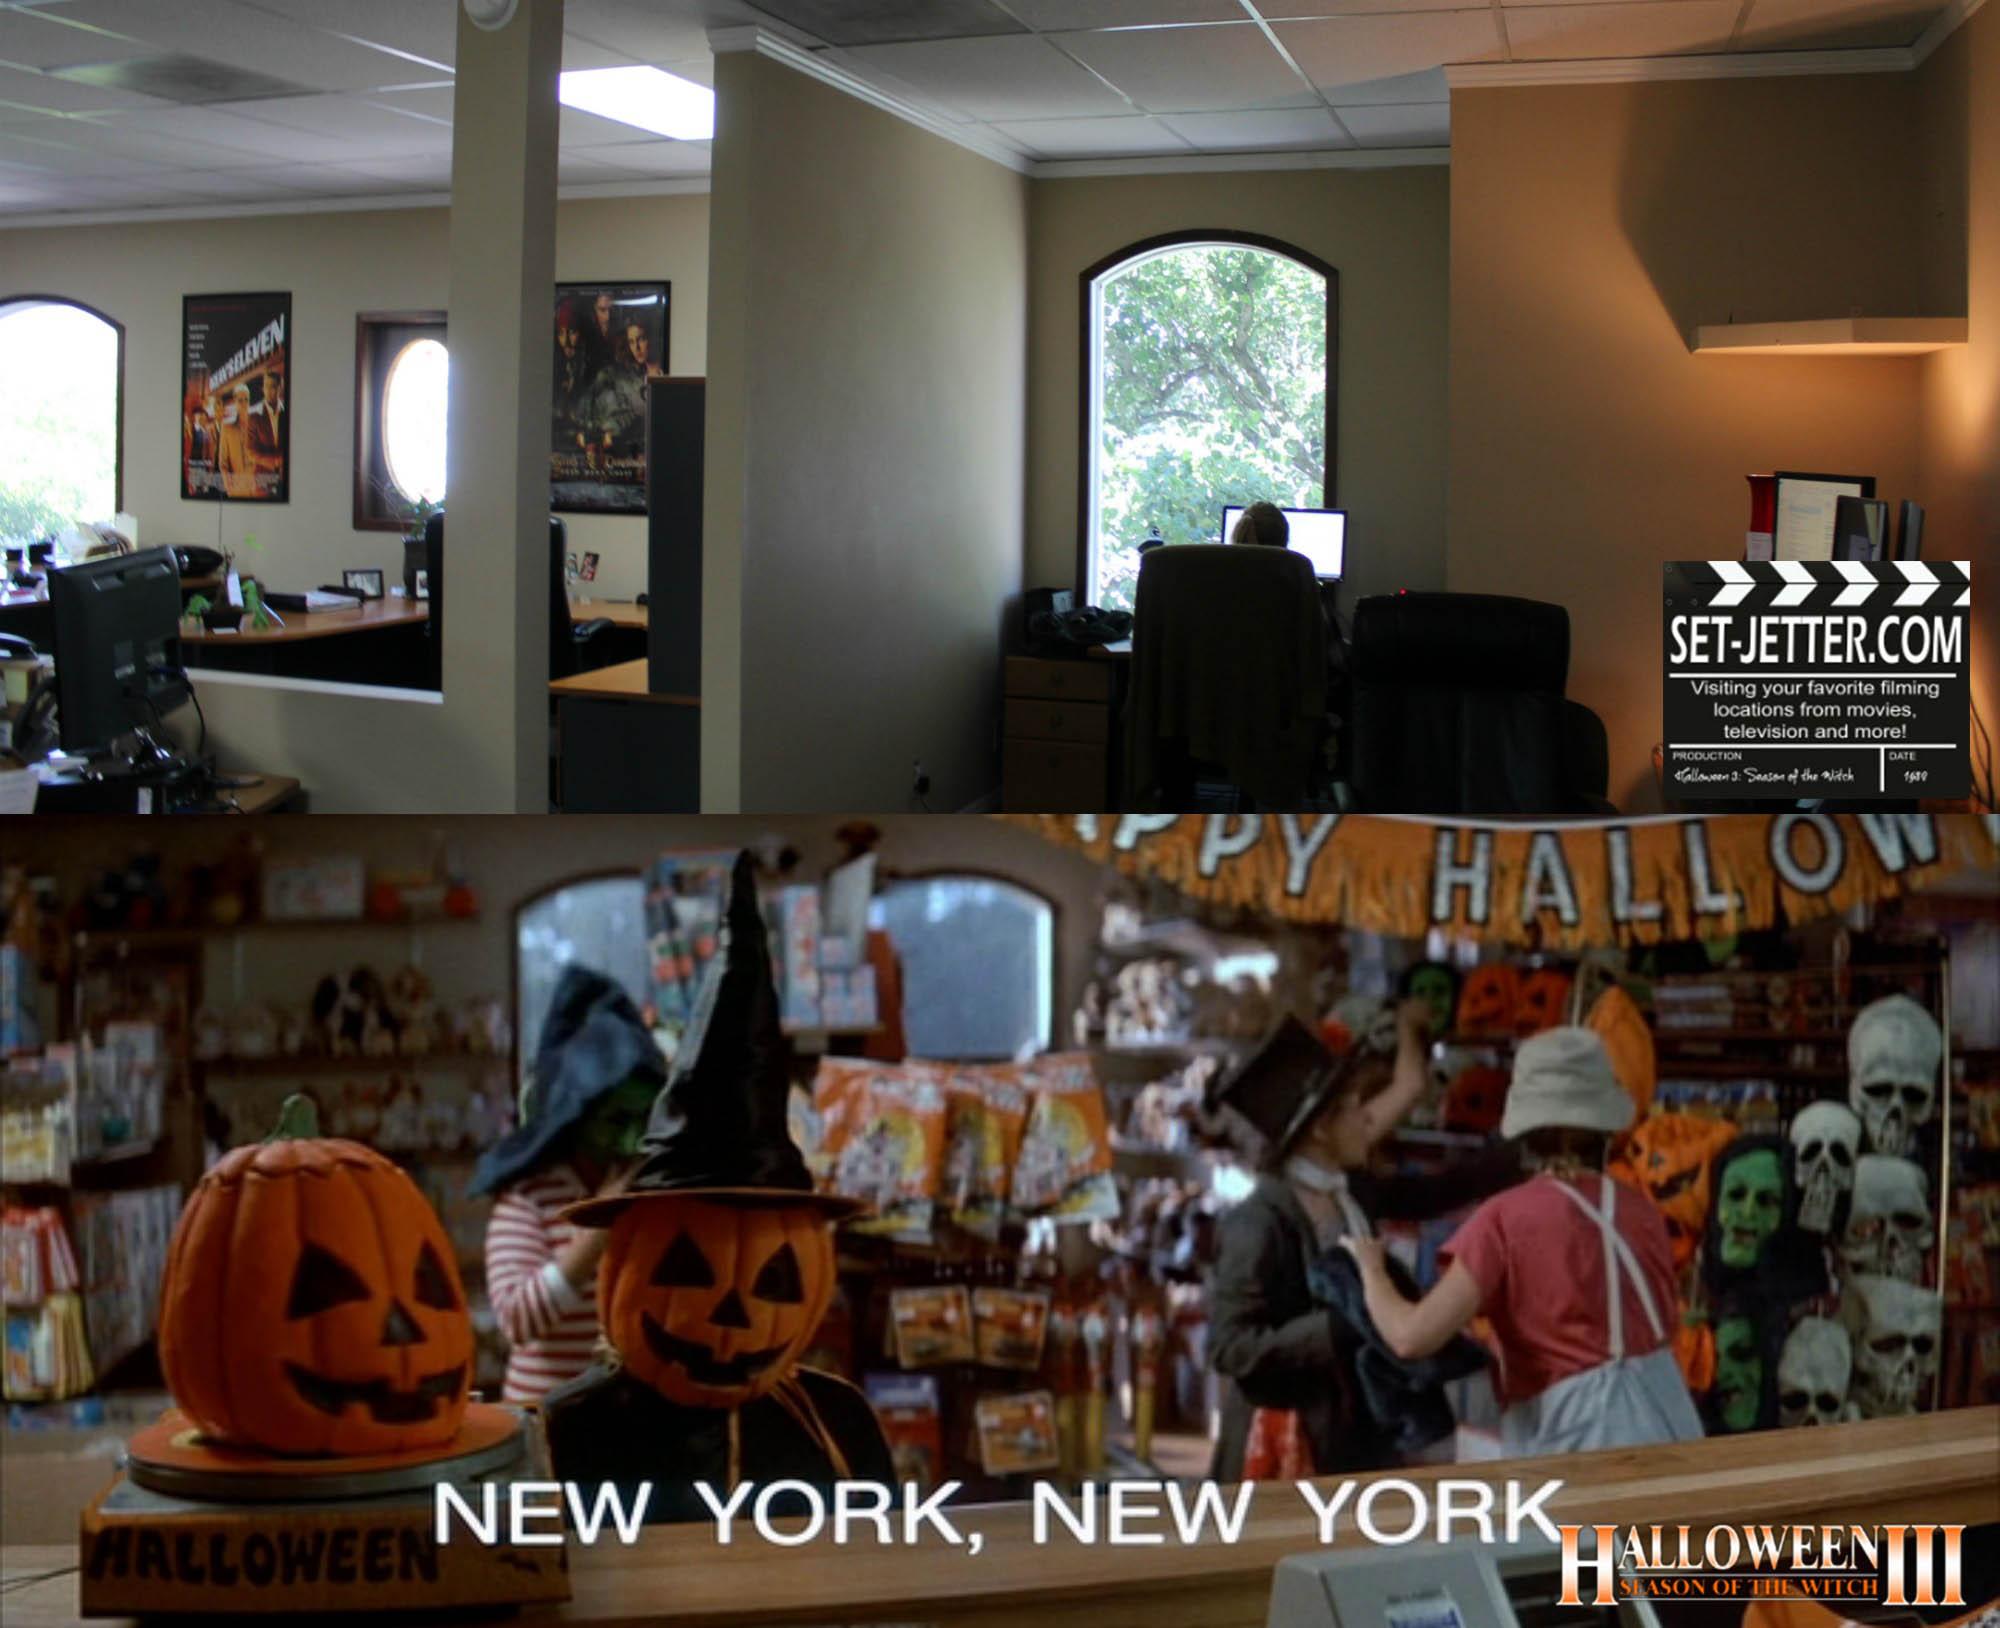 HalloweenIII-NY-04.jpg